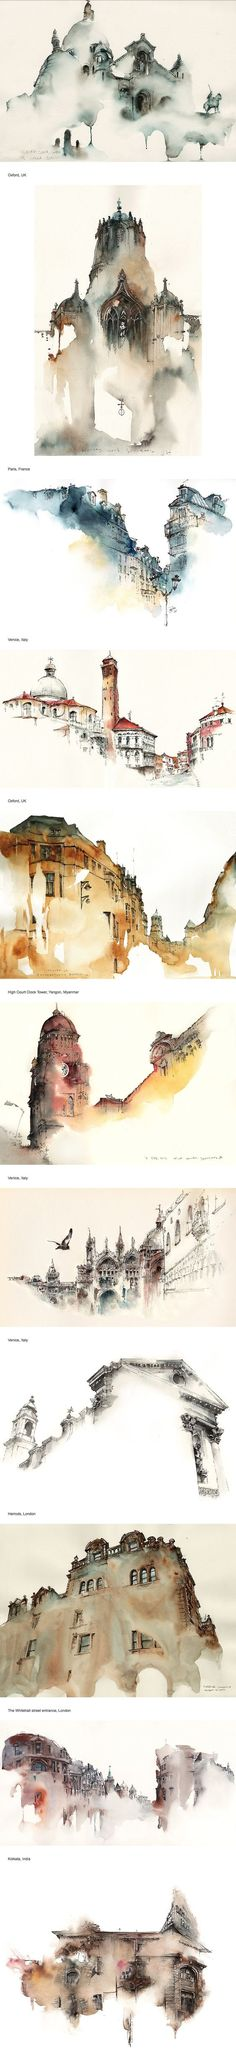 Elusive Architecture in Watercolors of Korean Artist Sunga Park:                                                                                                                                                                                 More